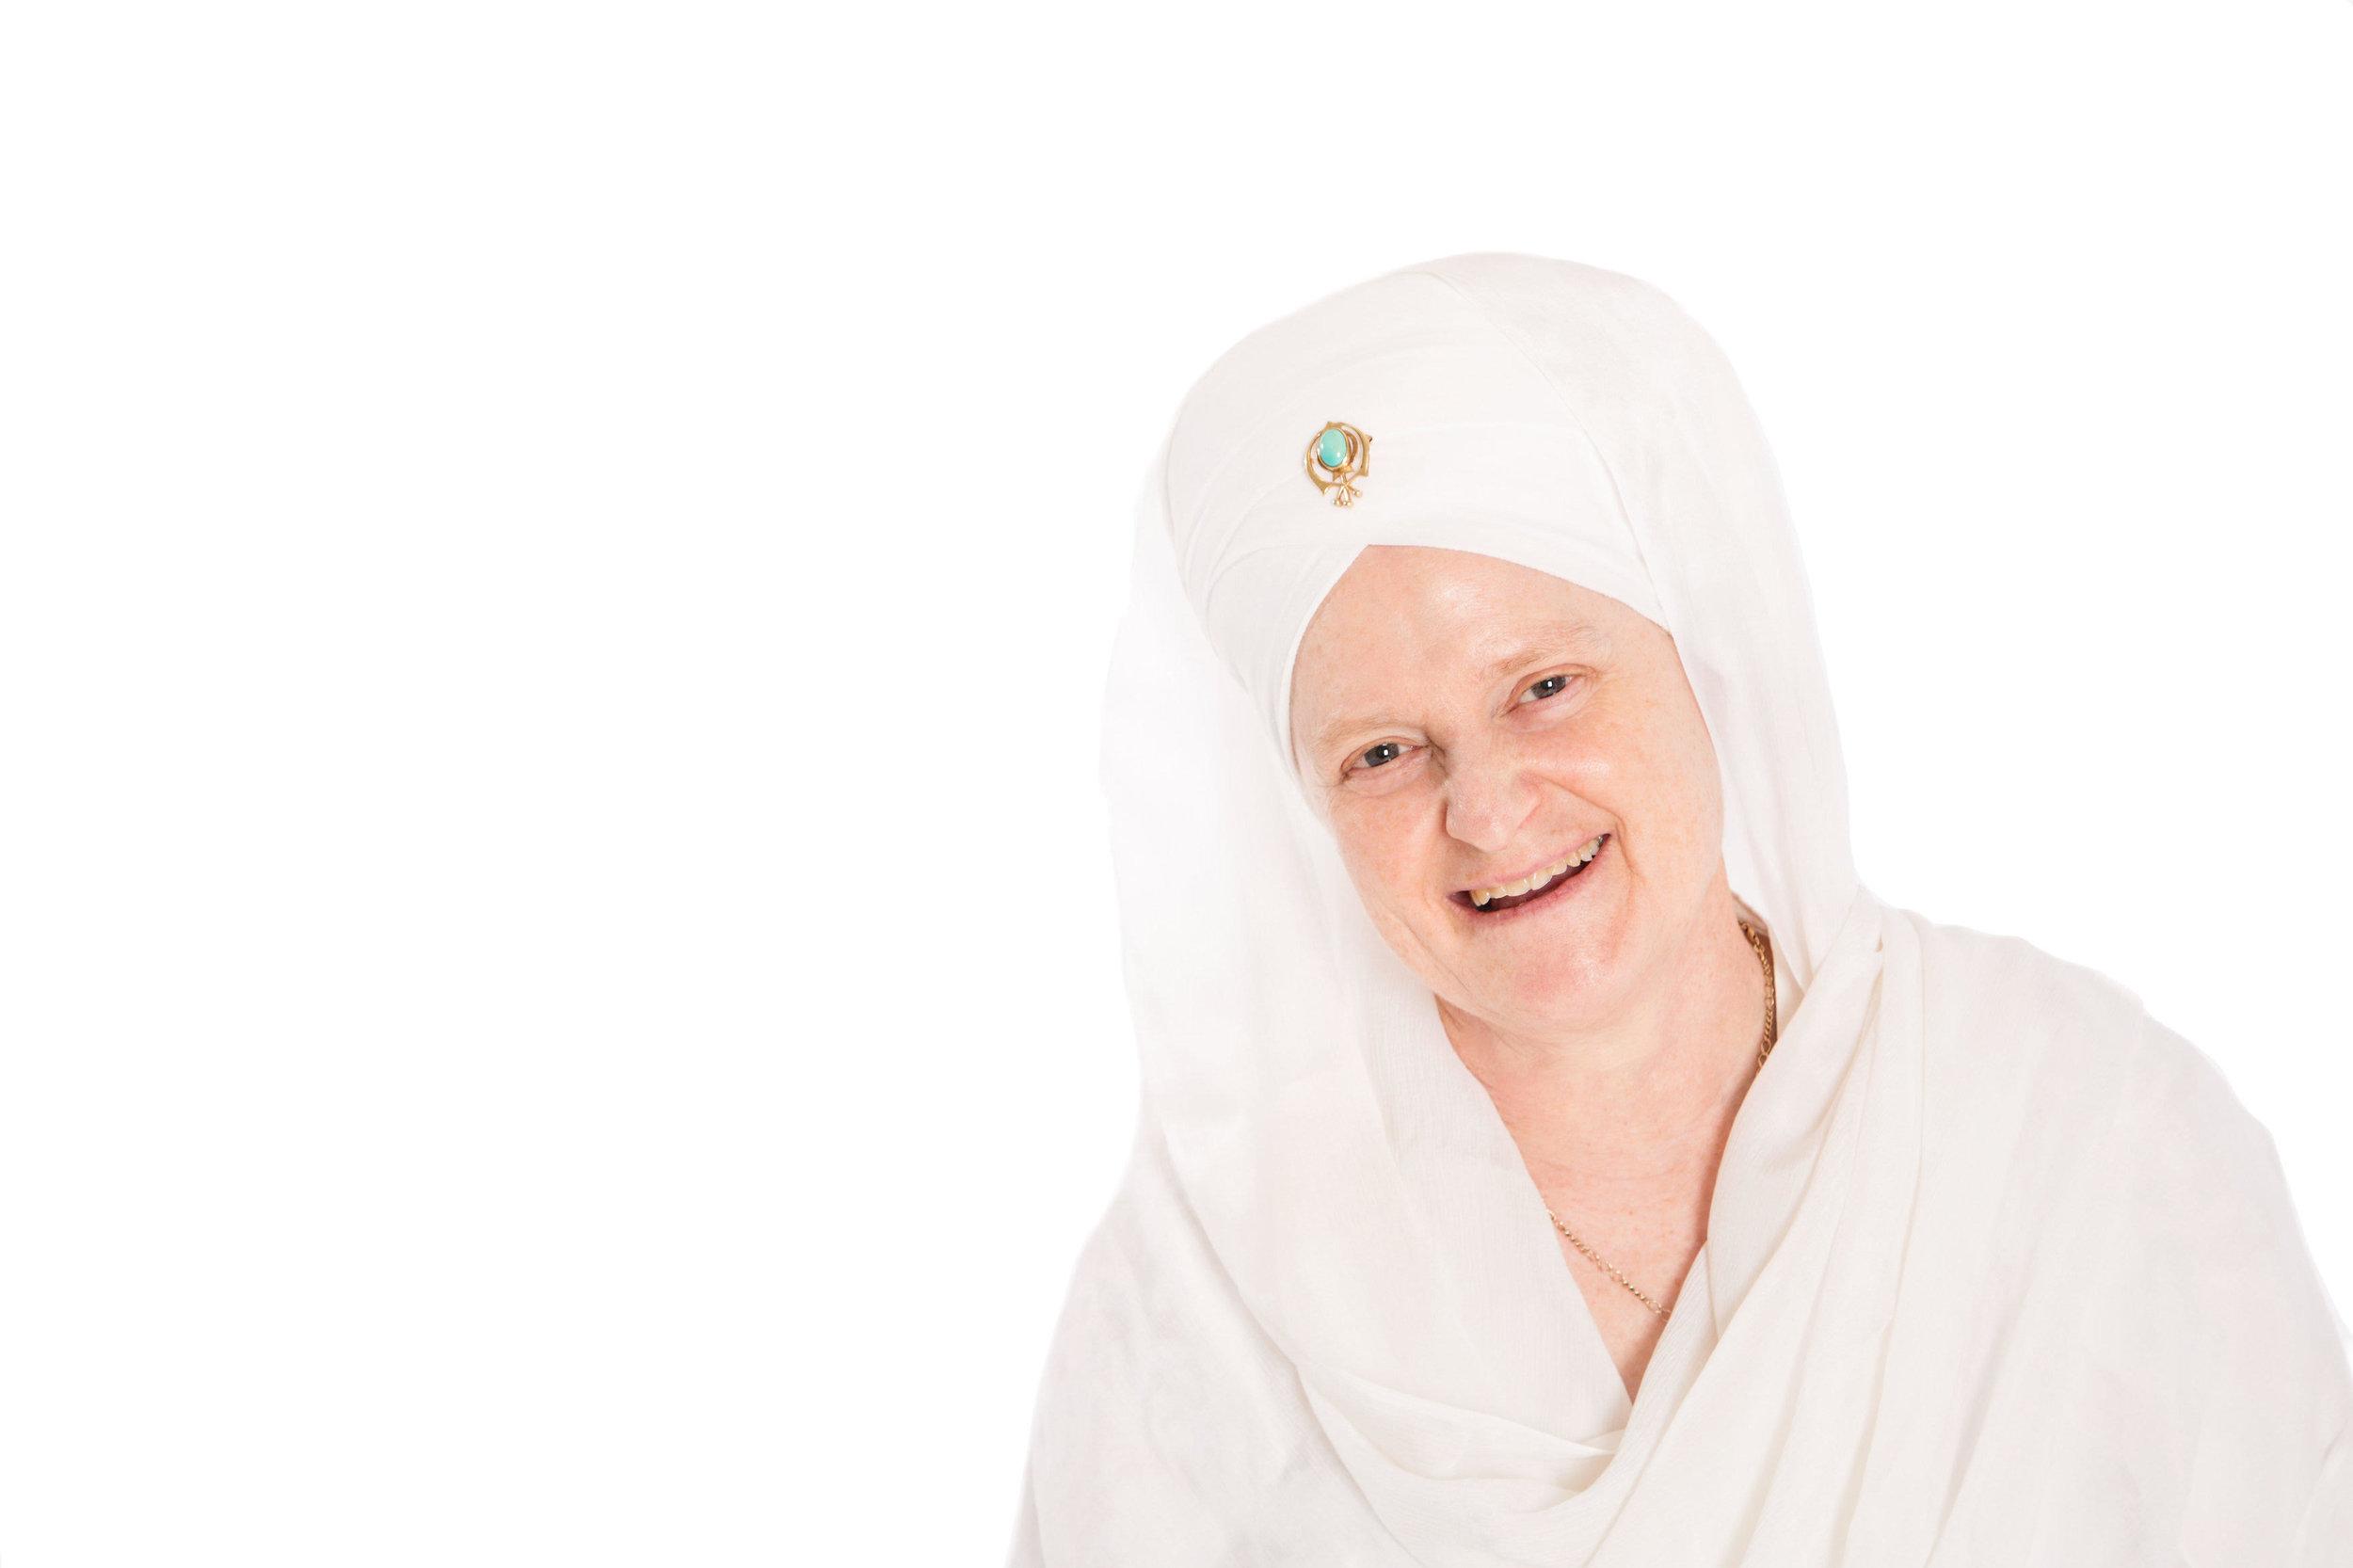 Awtar Kaur Khalsa (Lead)   Director of the San Francisco Ashram. Awtar has been studying, teaching and sharing Kundalini yoga and meditation since 1972. She has a wonderful sense of humor and openness.